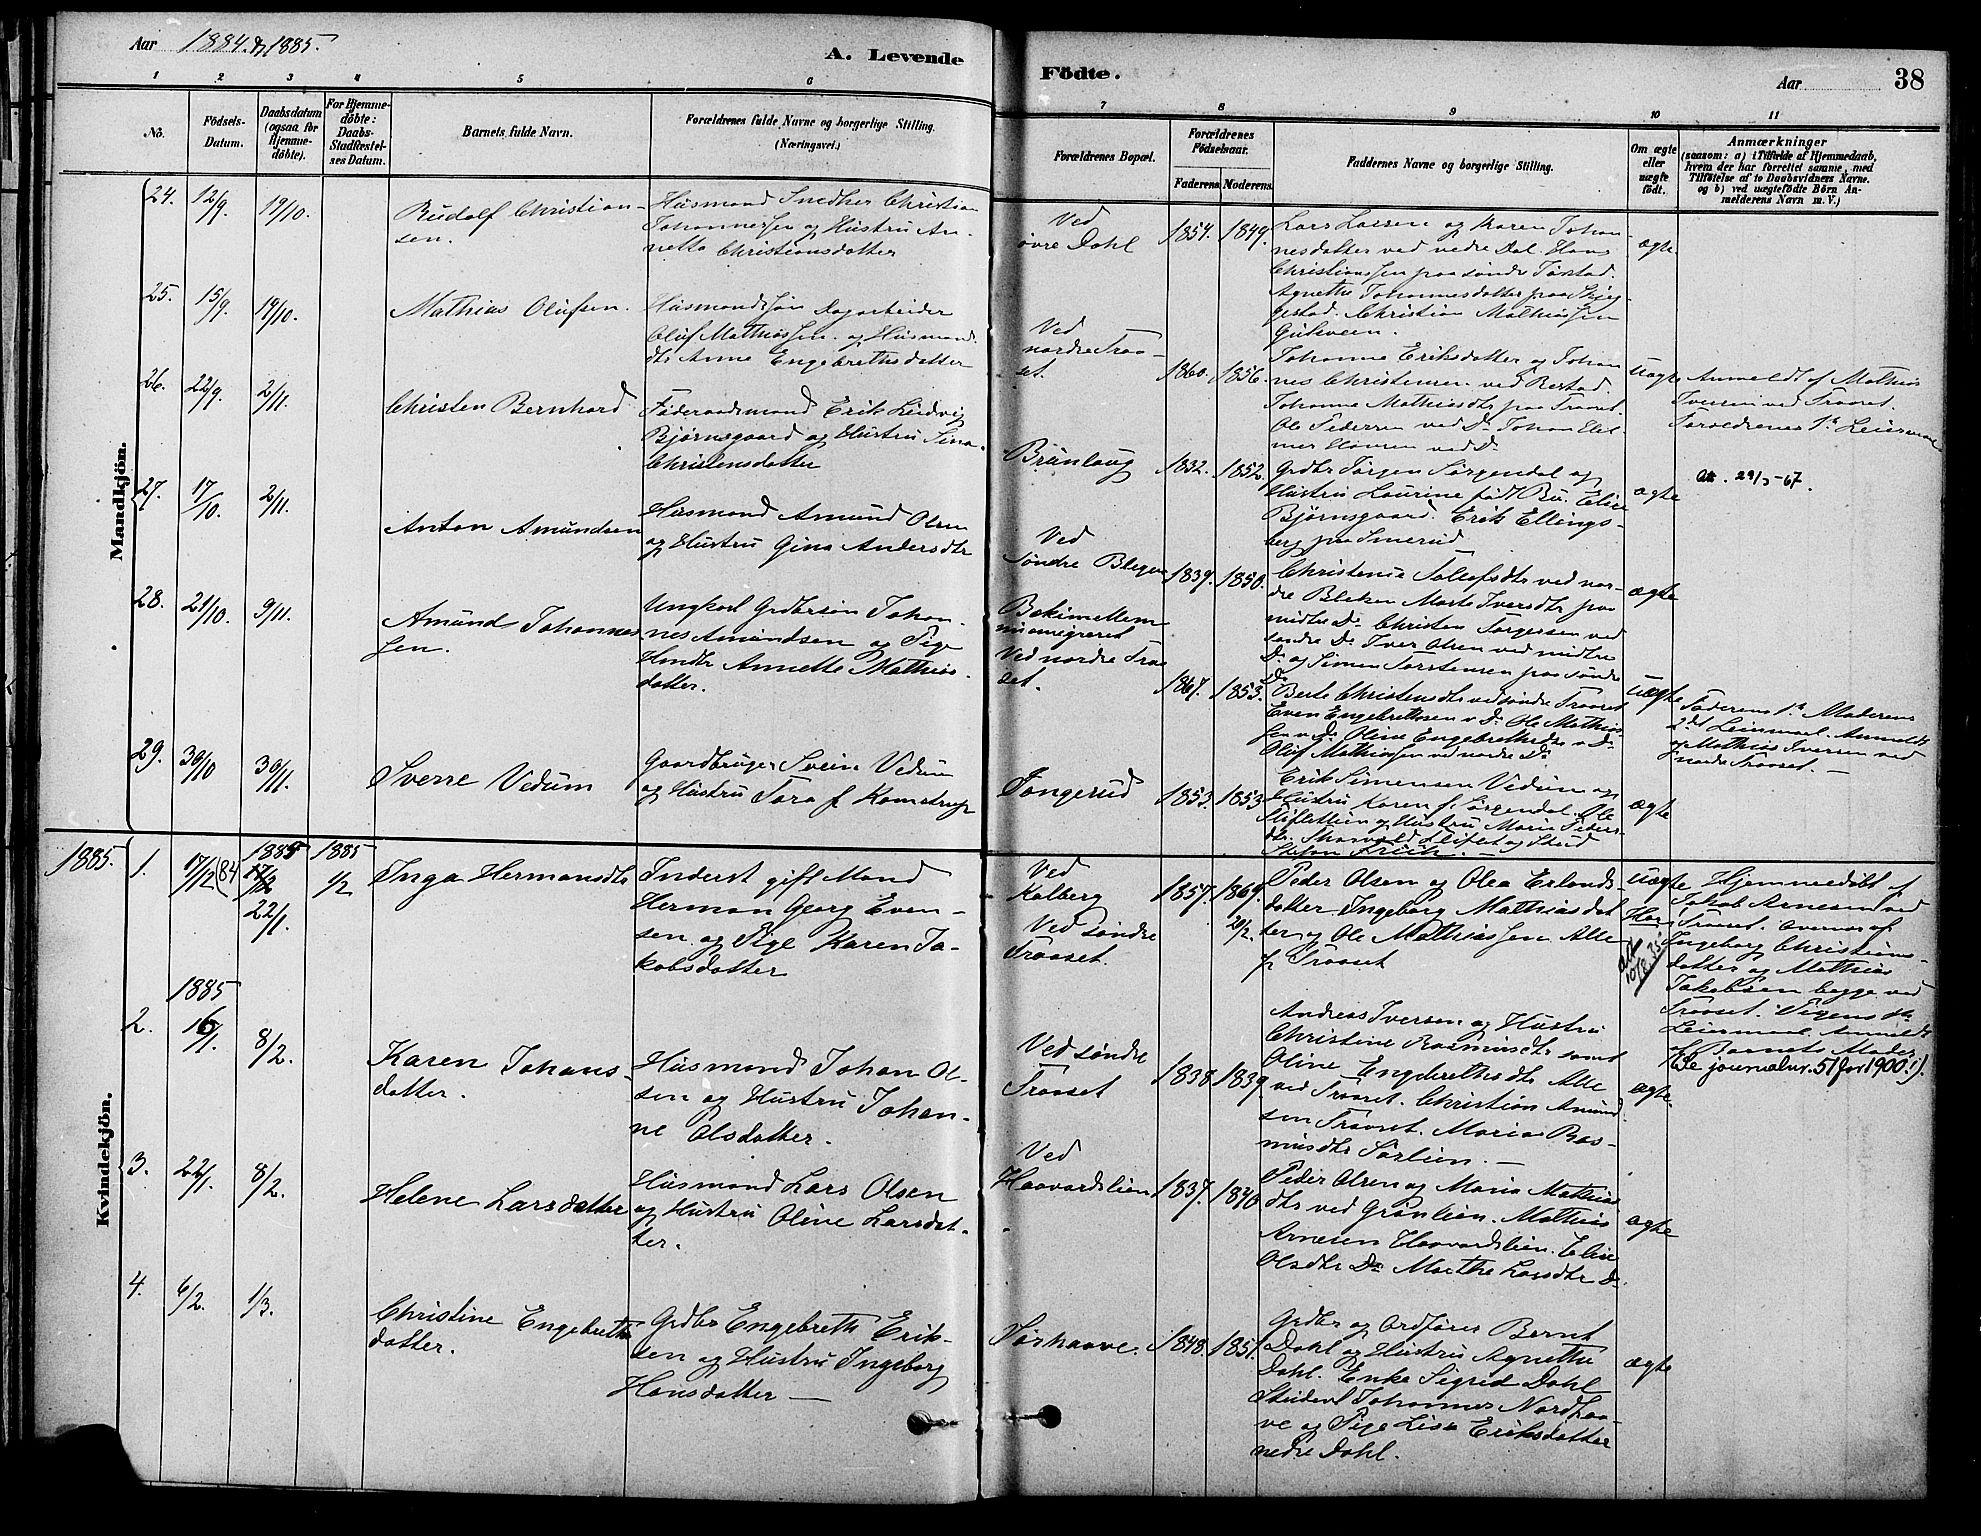 SAH, Fåberg prestekontor, Ministerialbok nr. 8, 1879-1898, s. 38